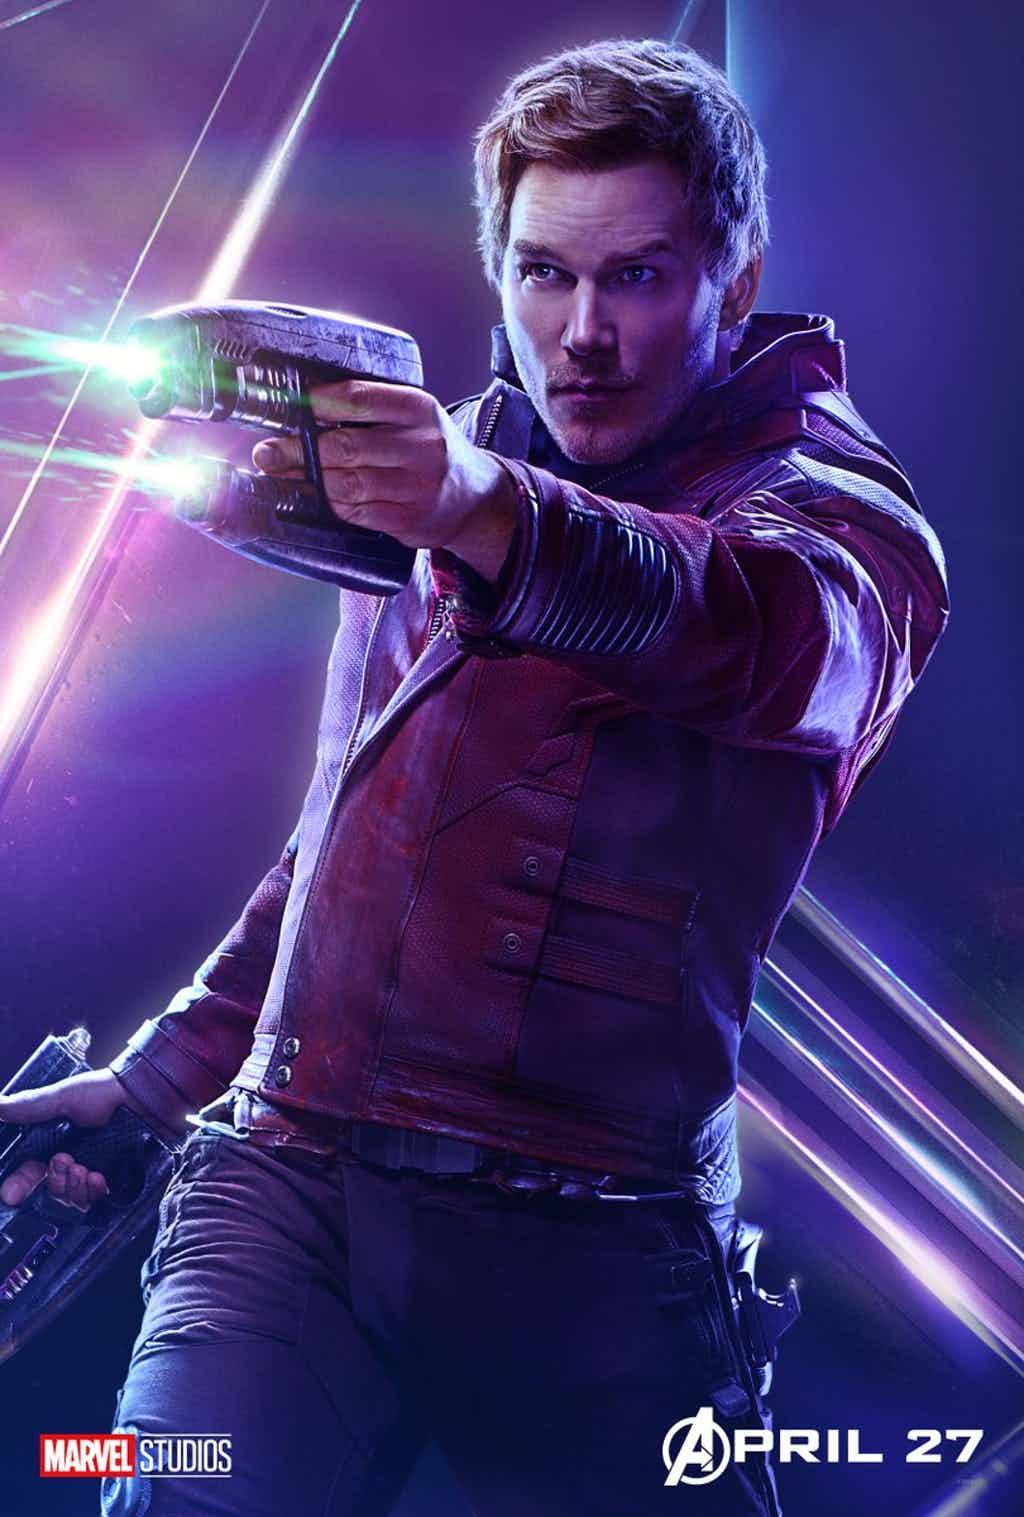 szmk_marvel_infinity_war_vegtelen_haboru_bosszuallok_avengers_ironman_hulk_thor_captainamaerica_guardians_galaxy_16.jpg